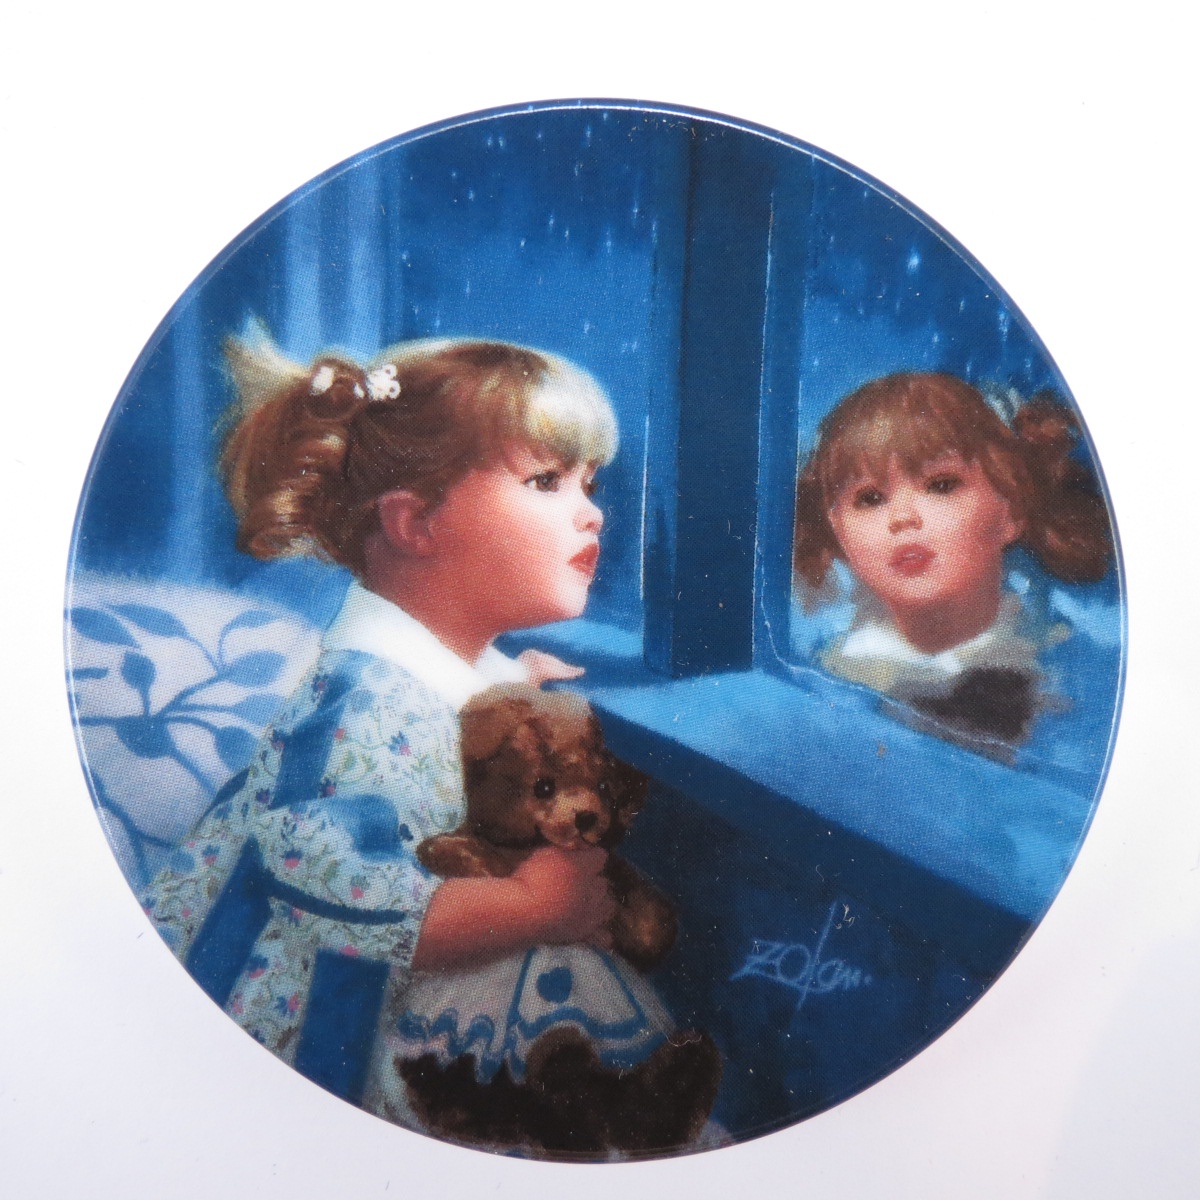 Декоративная тарелка Pemberton & Oakes Любимый детский художник Америки, 91462889